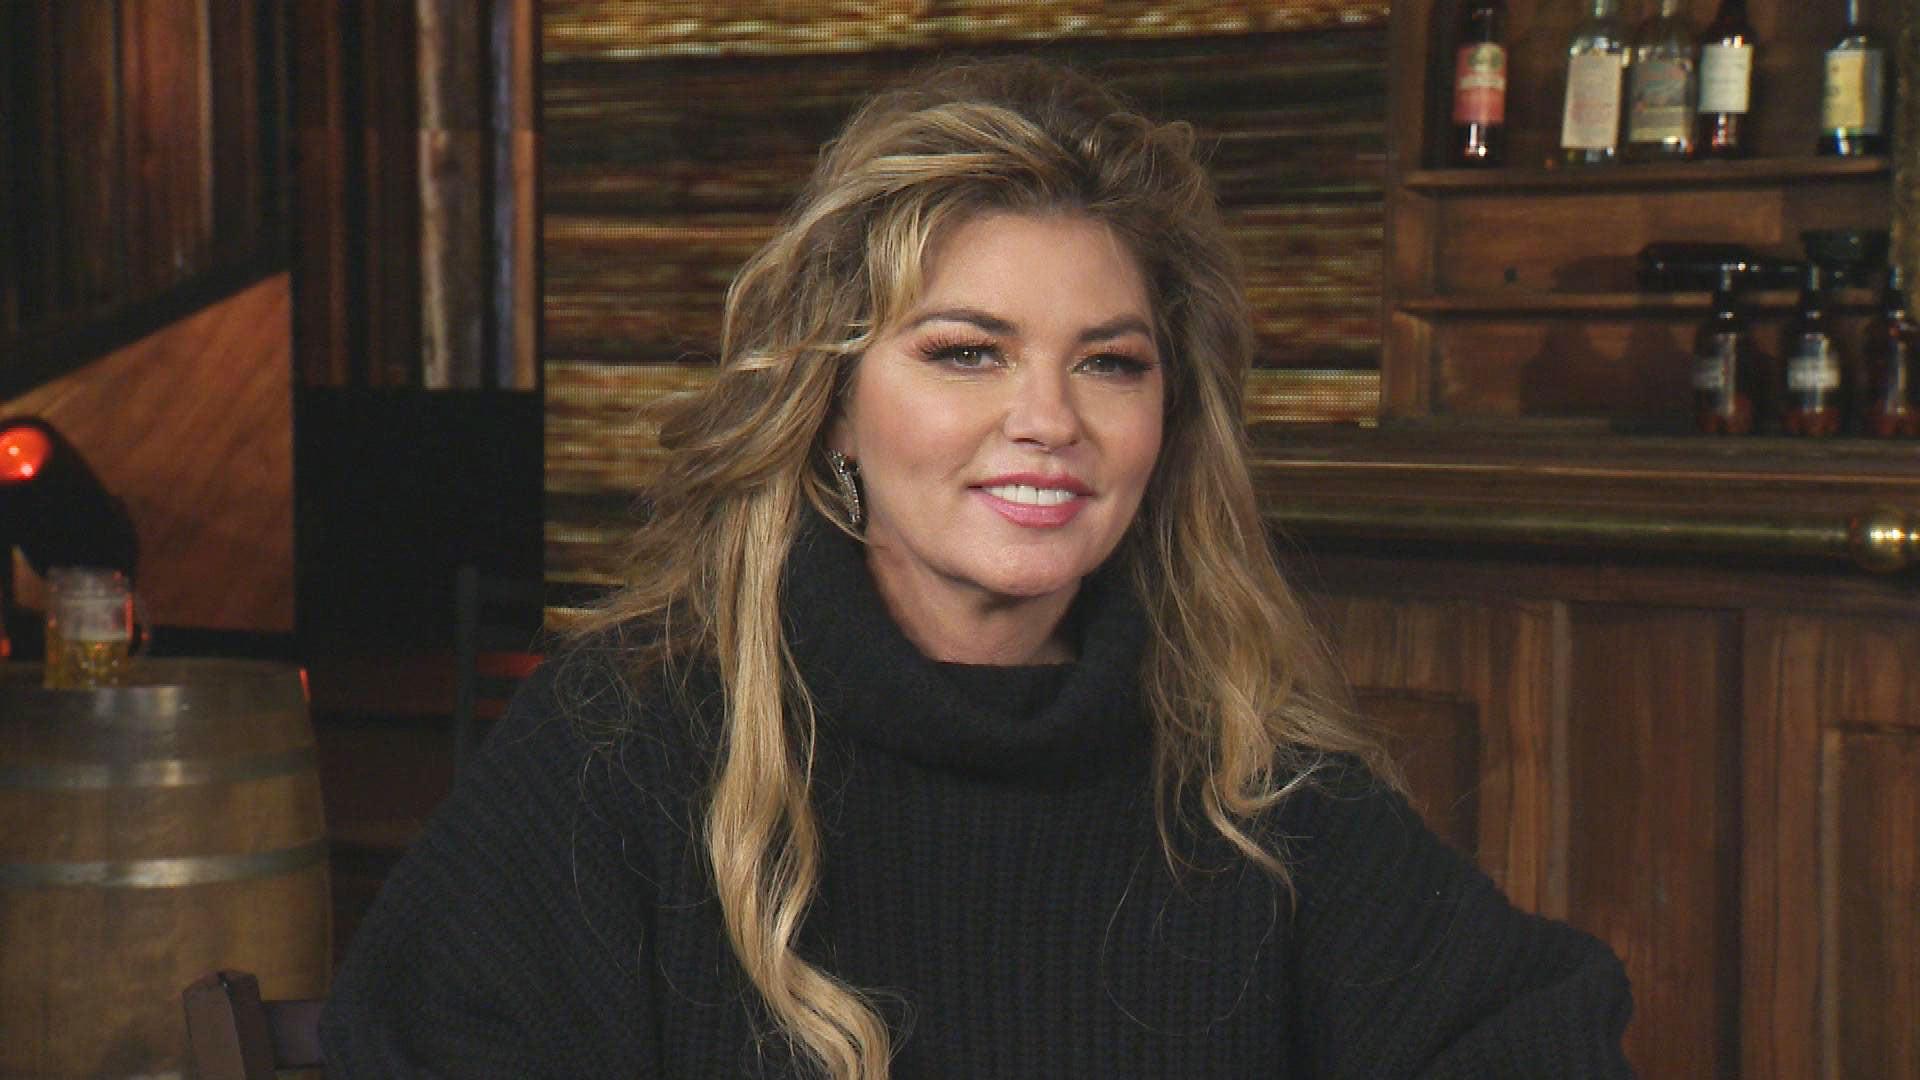 Shania Twain Talks Fanboy Diplo, Brad Pitt & Cooking for David Copperfield in Las Vegas (Exclusive)